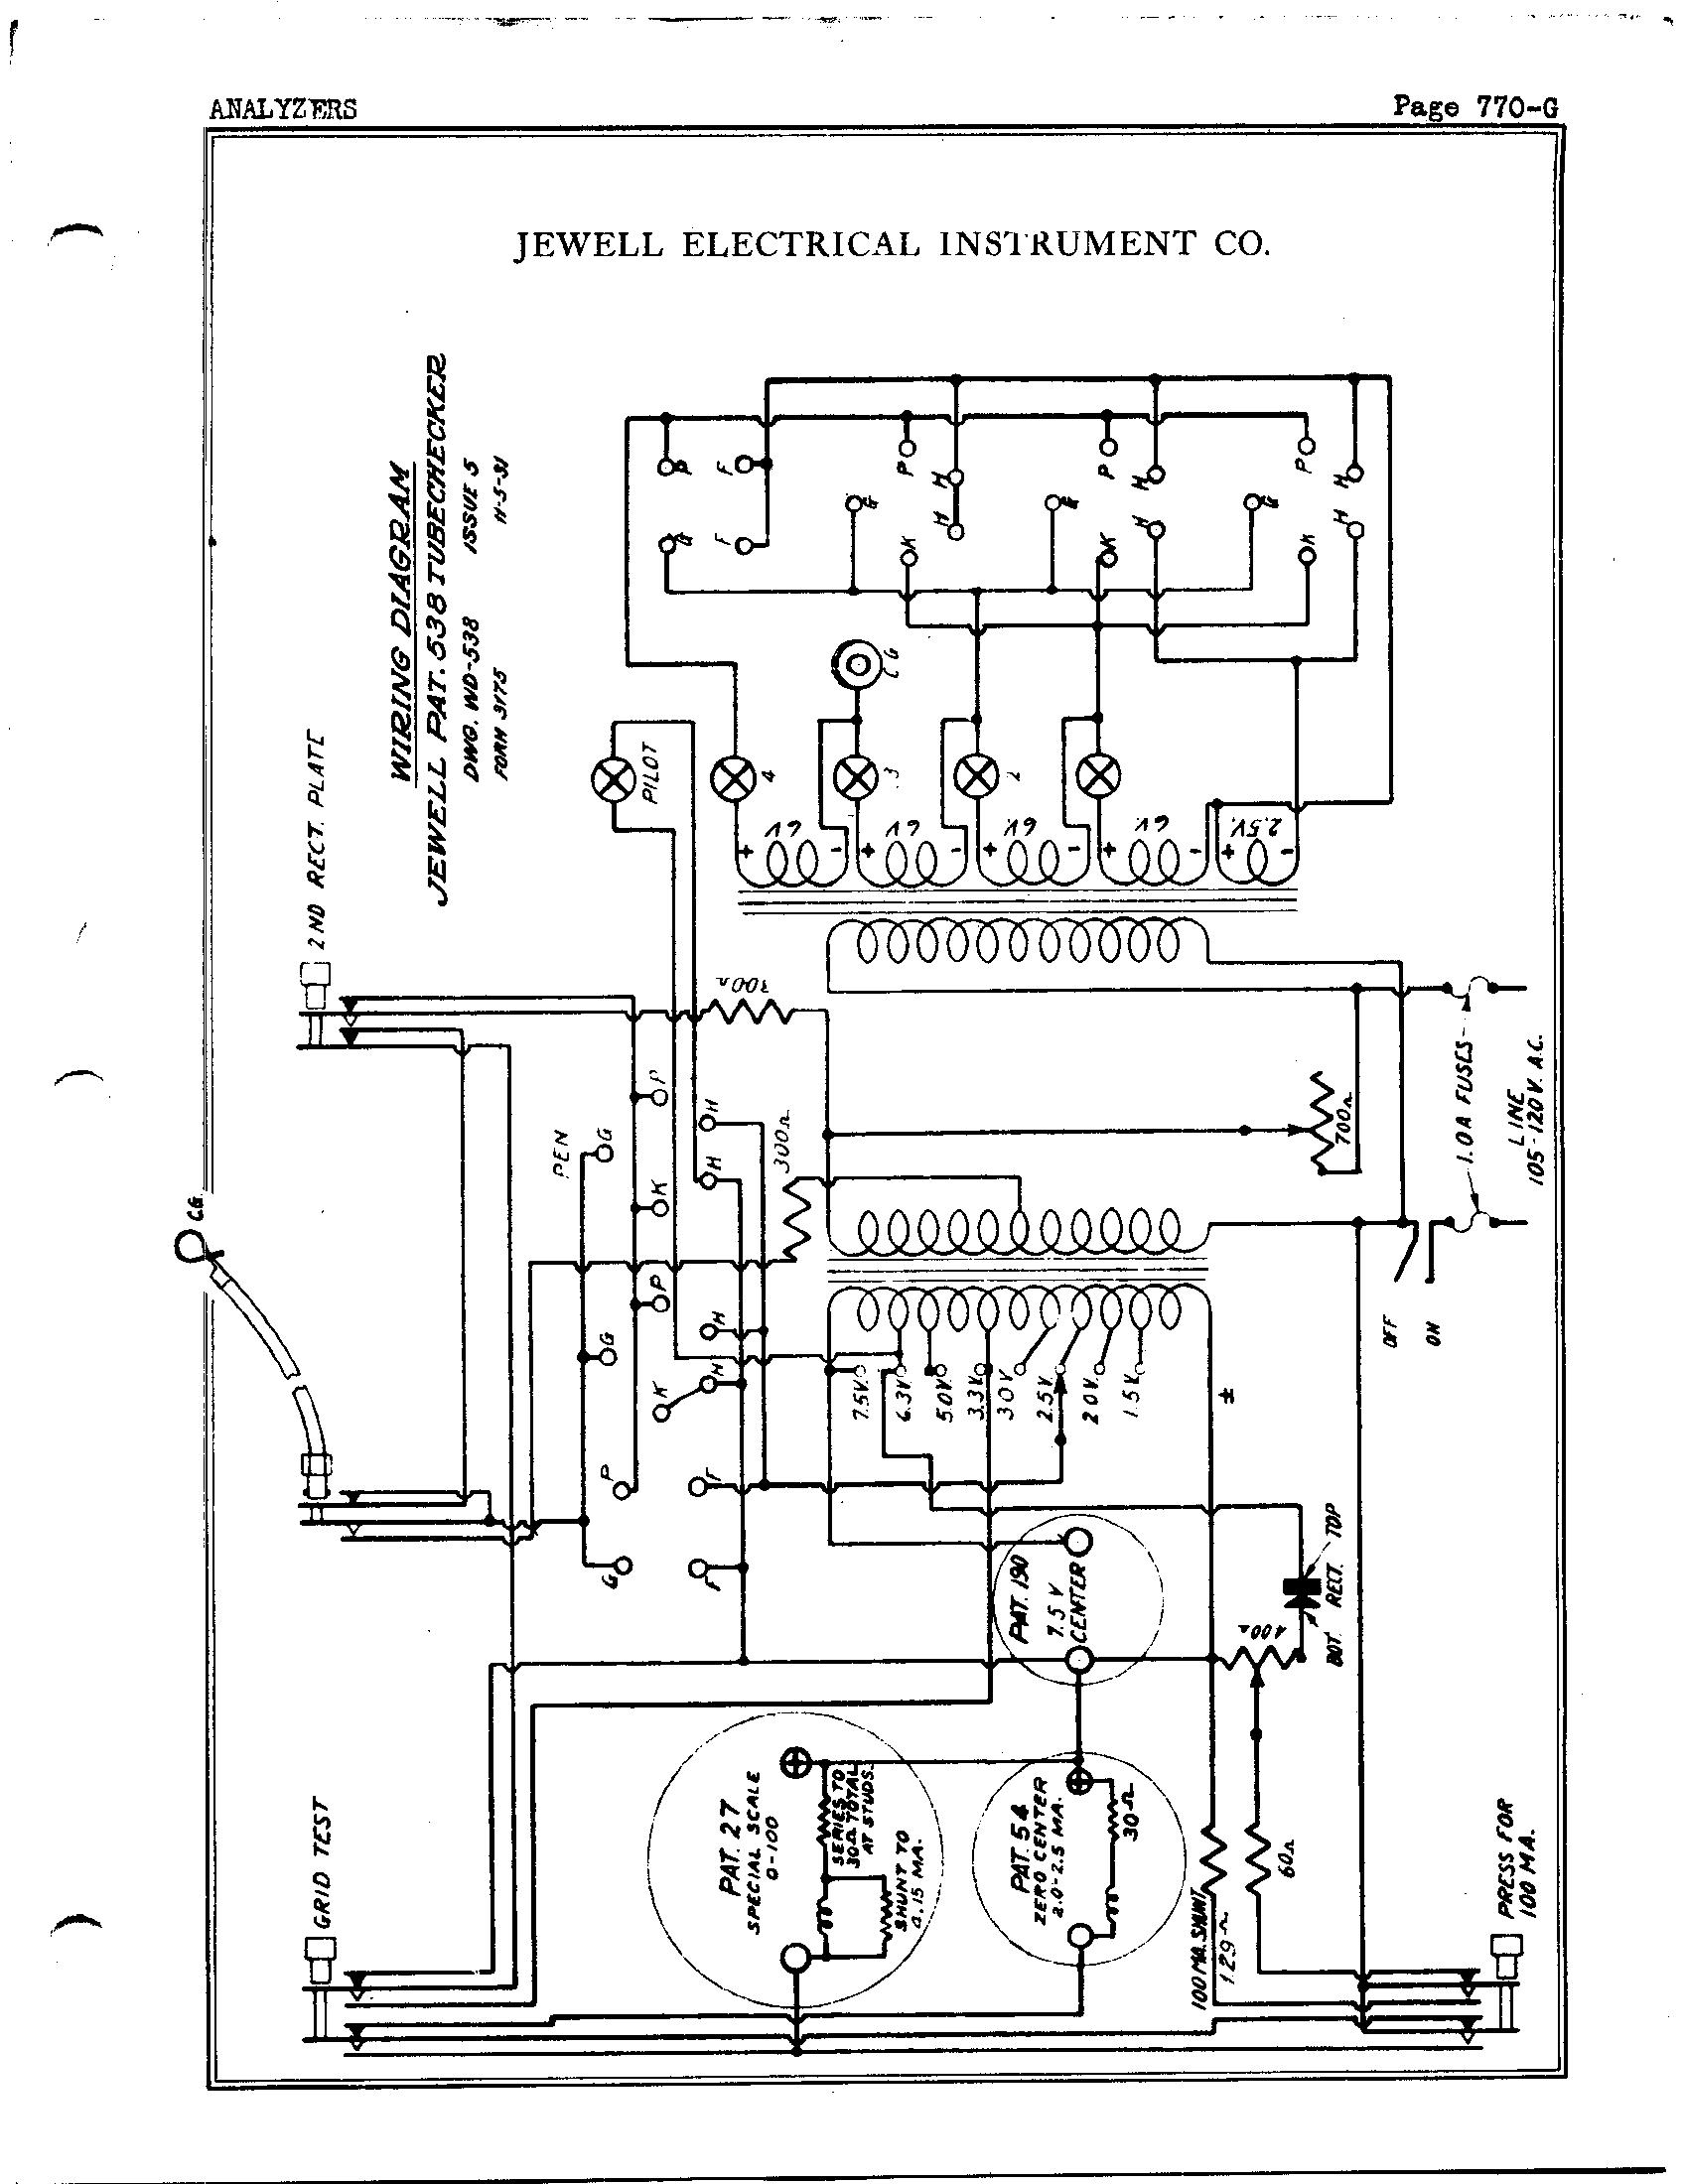 jewel electrical instrument co  pat  538 tubechecker